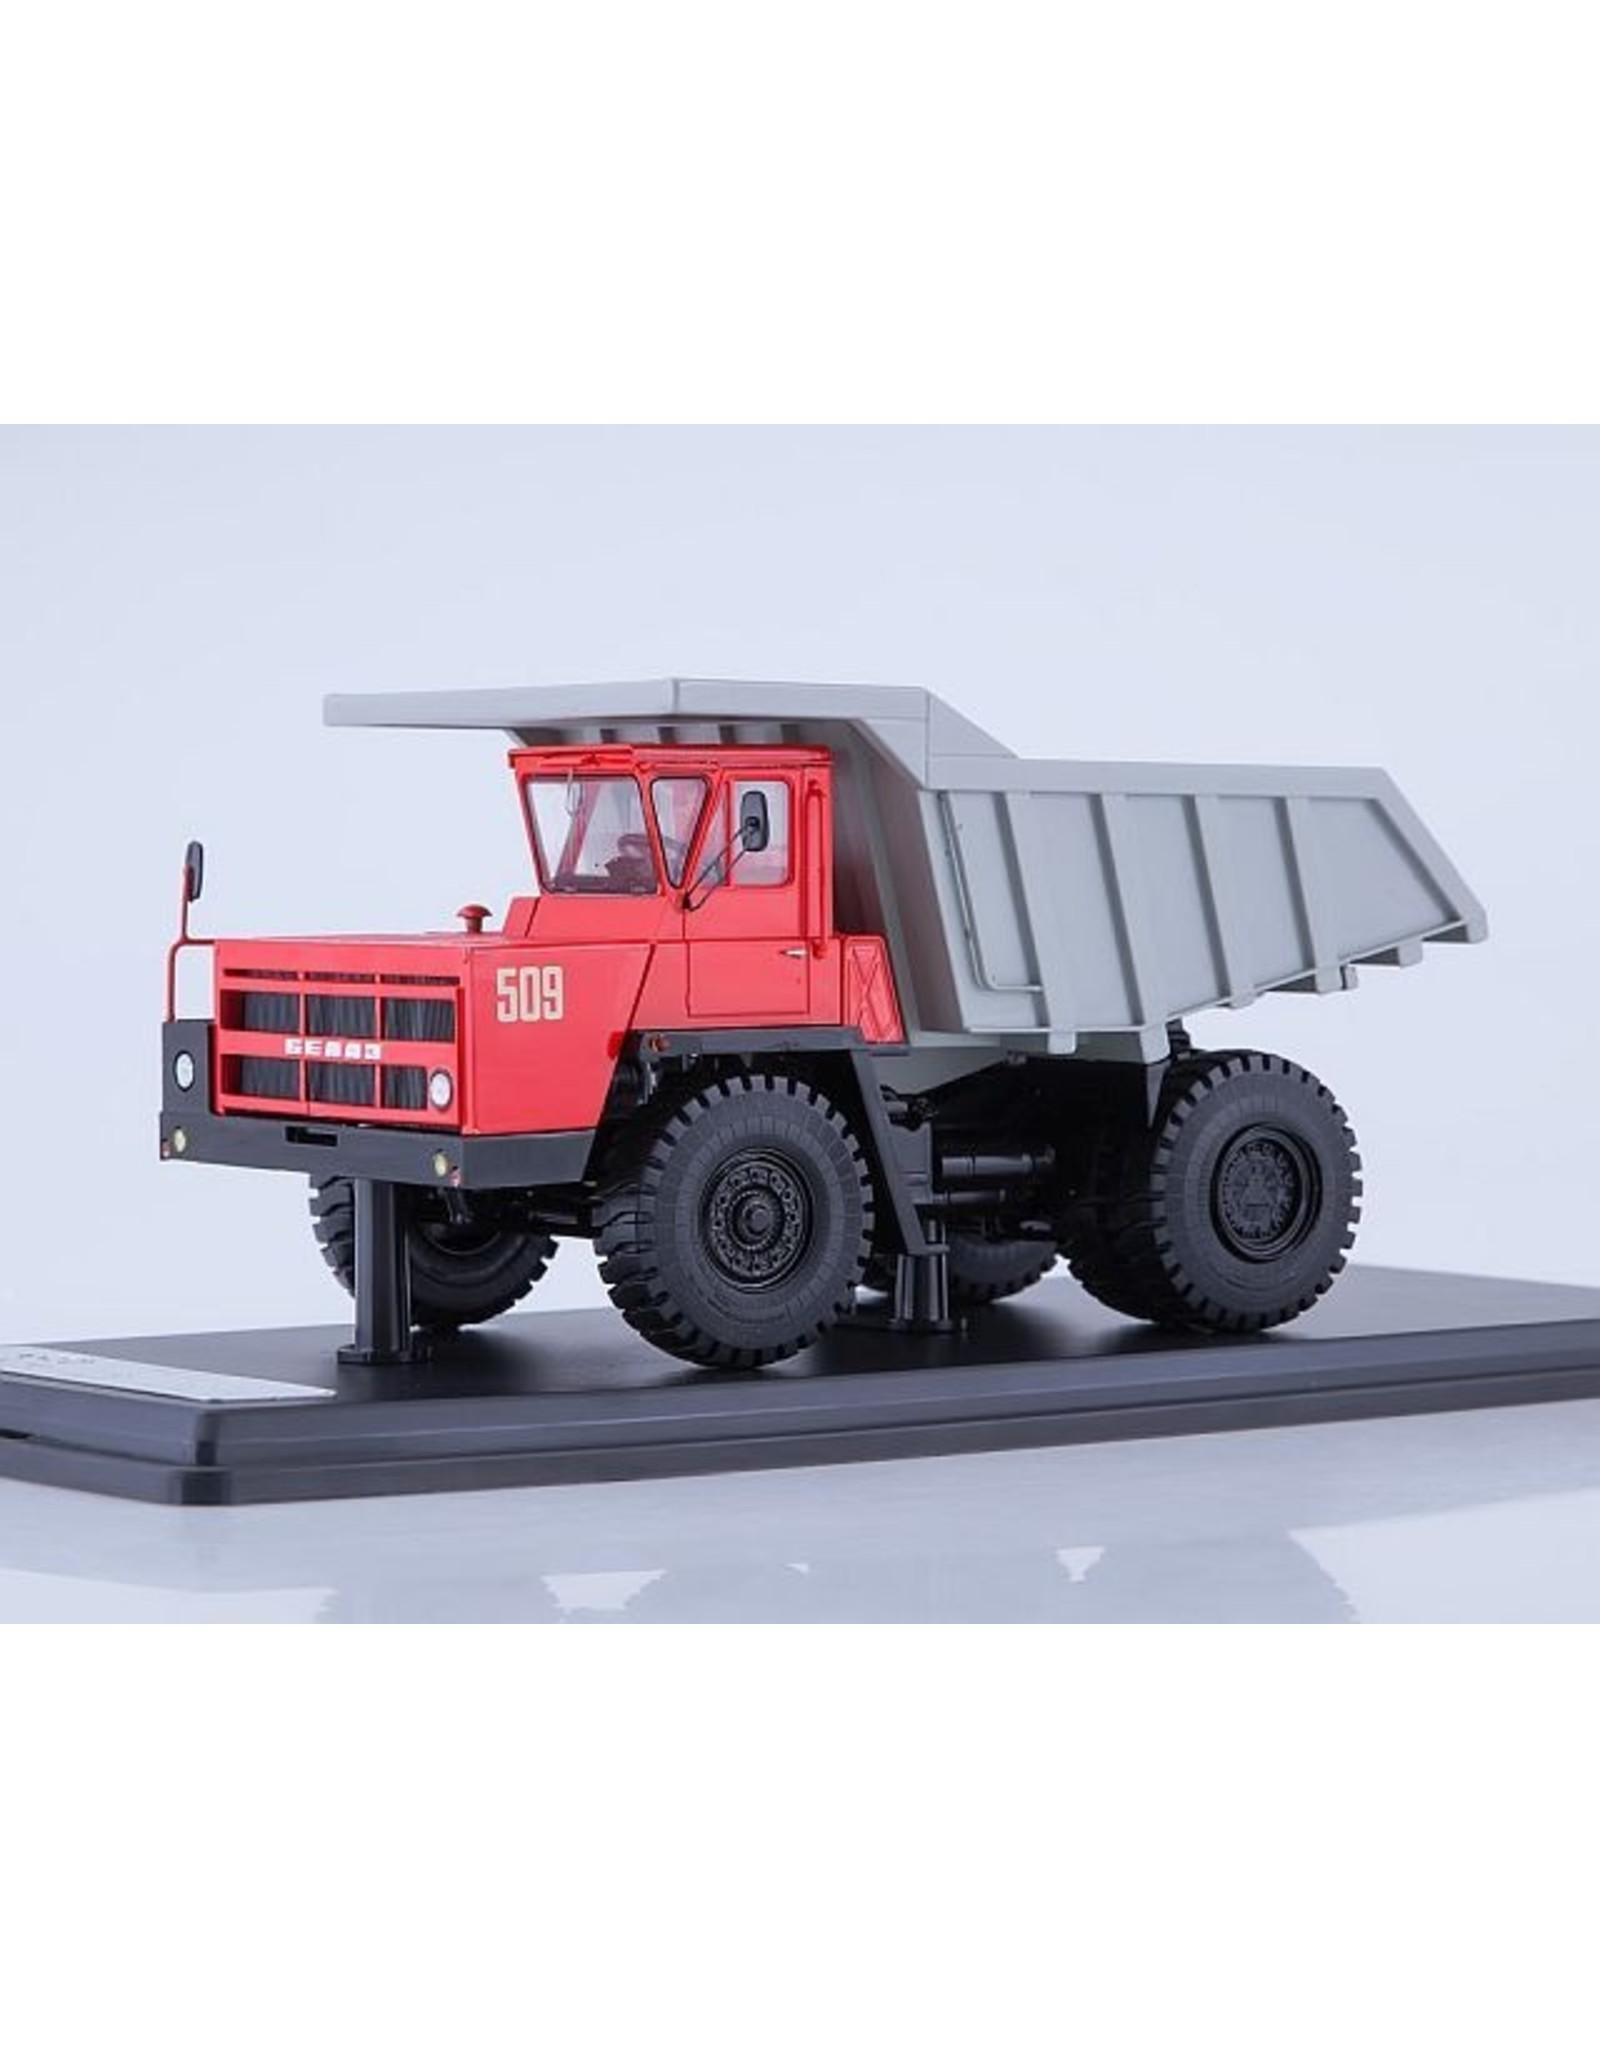 BelAZ BELAZ-7522 QUARRY DUMP TRUCK(red/grey)